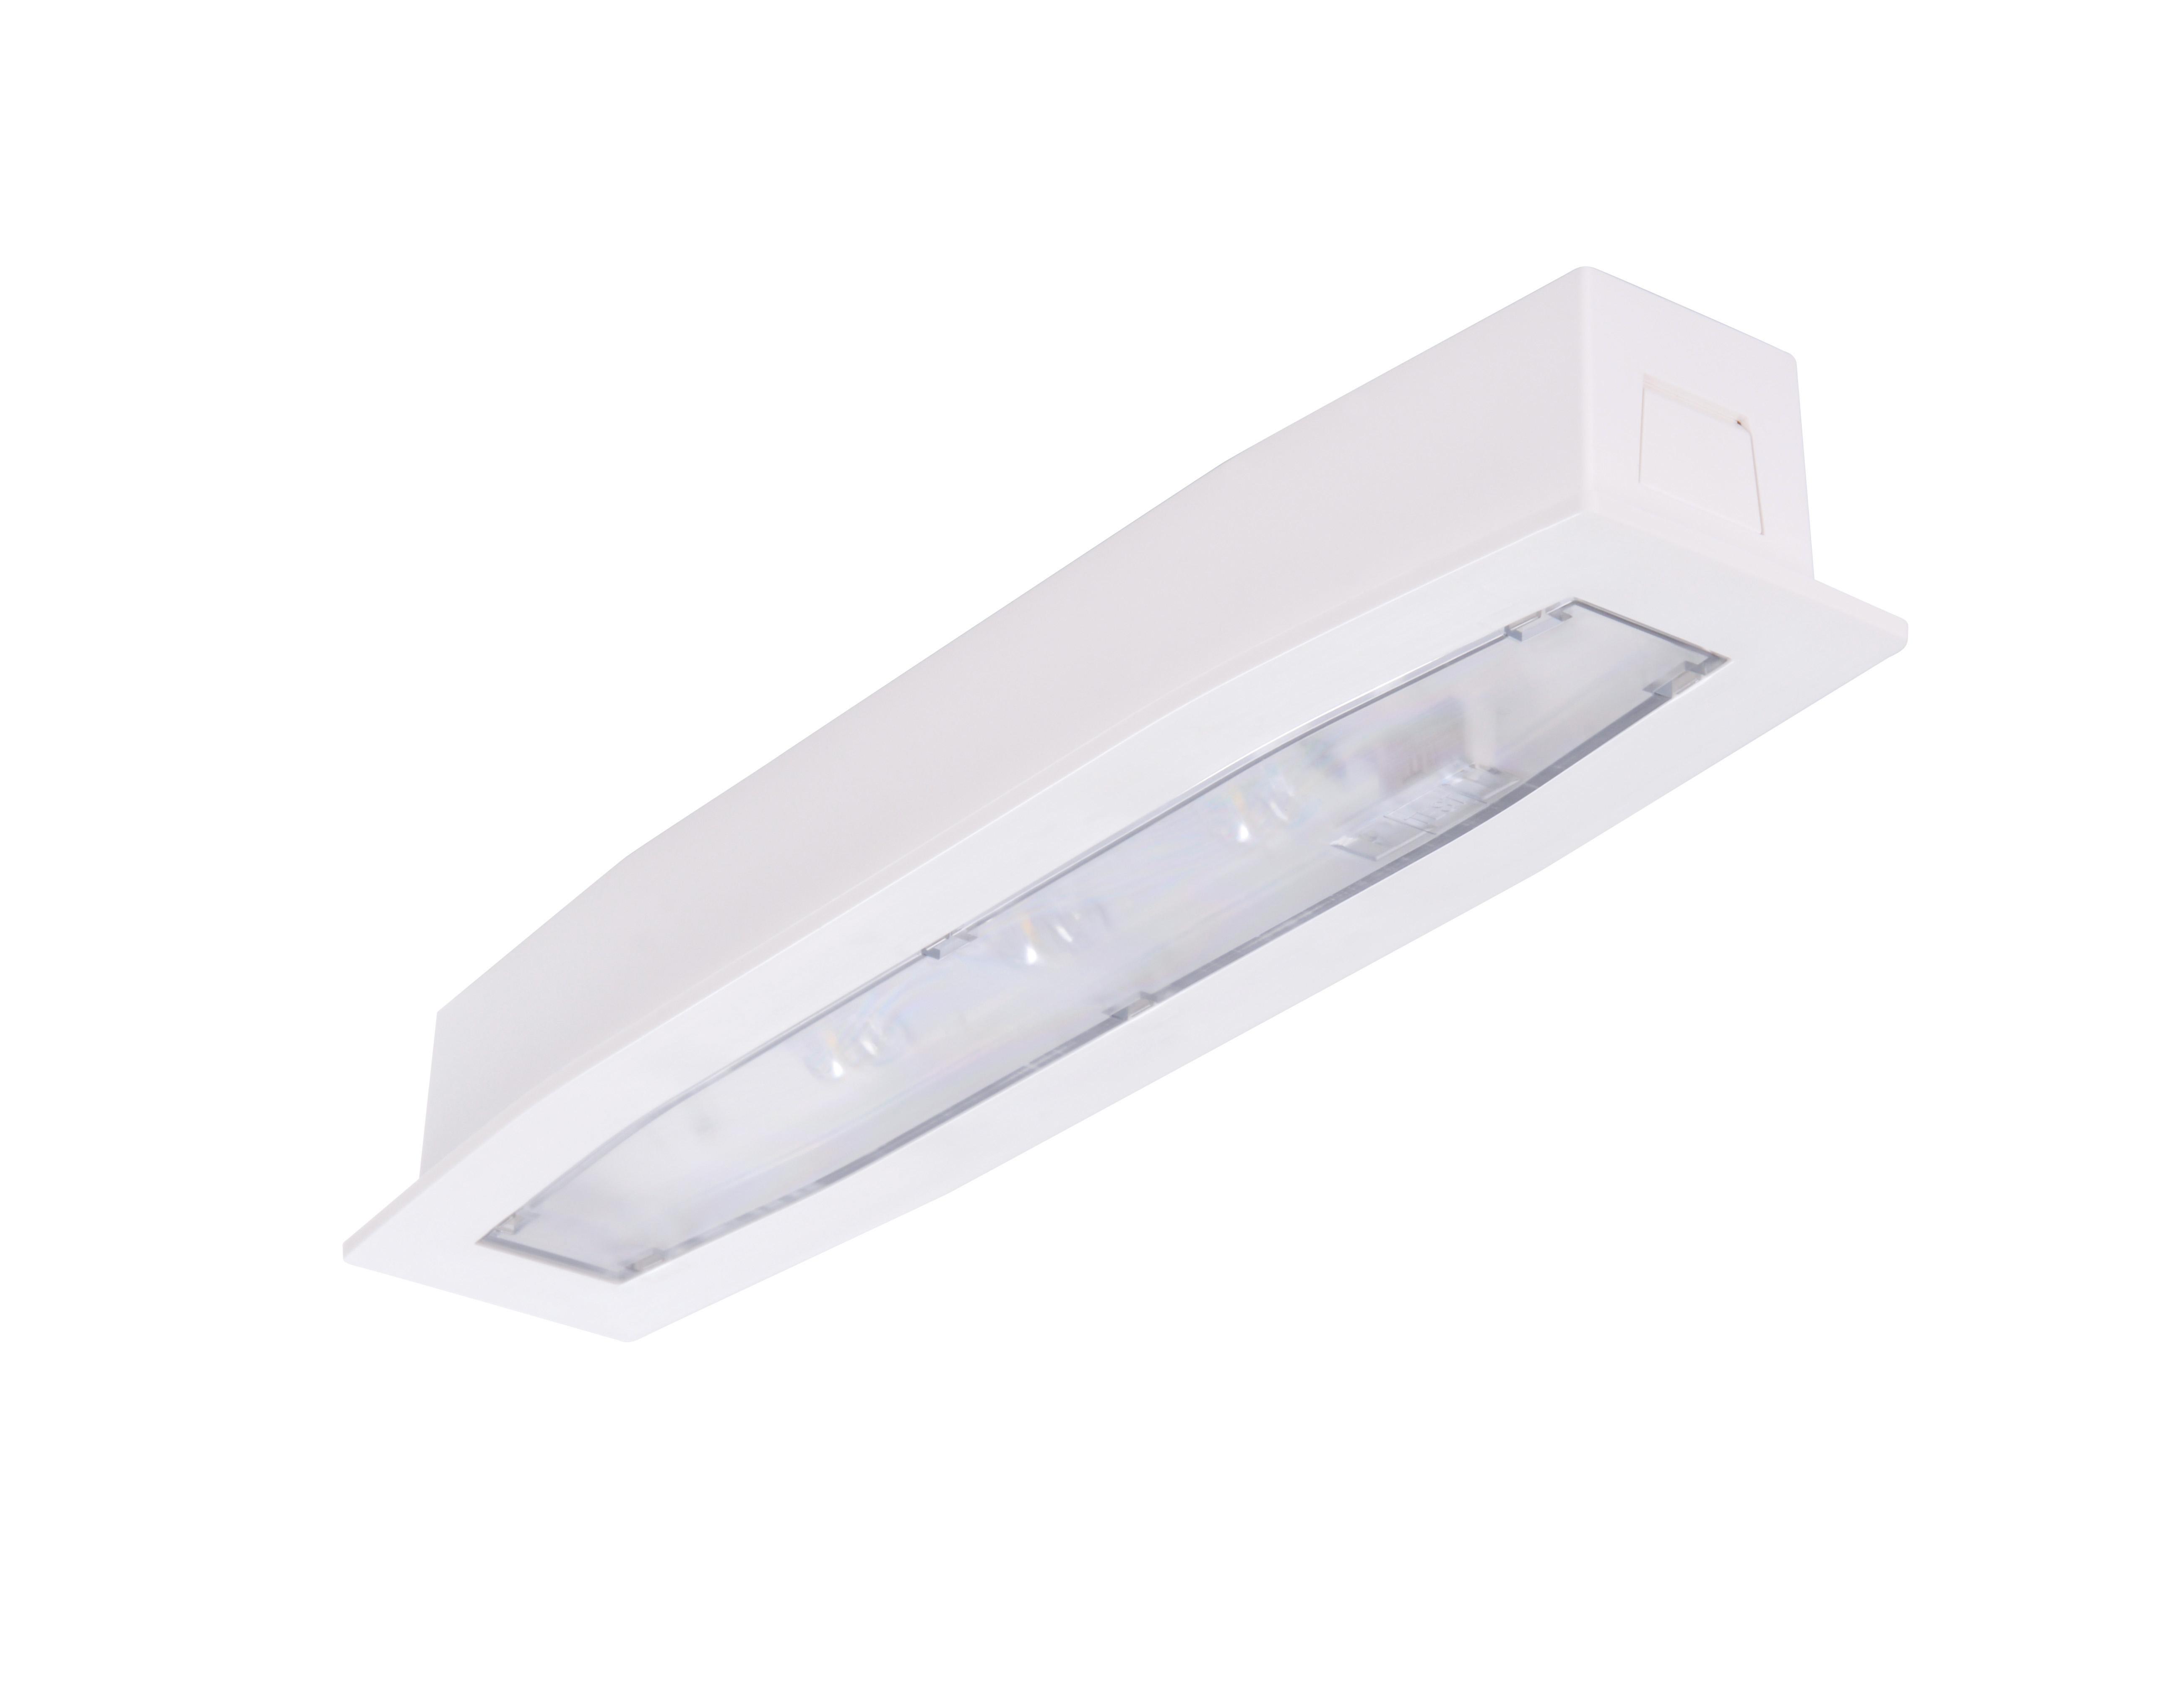 Lampa emergenta led Intelight 94771   2h nementinut test automat 3